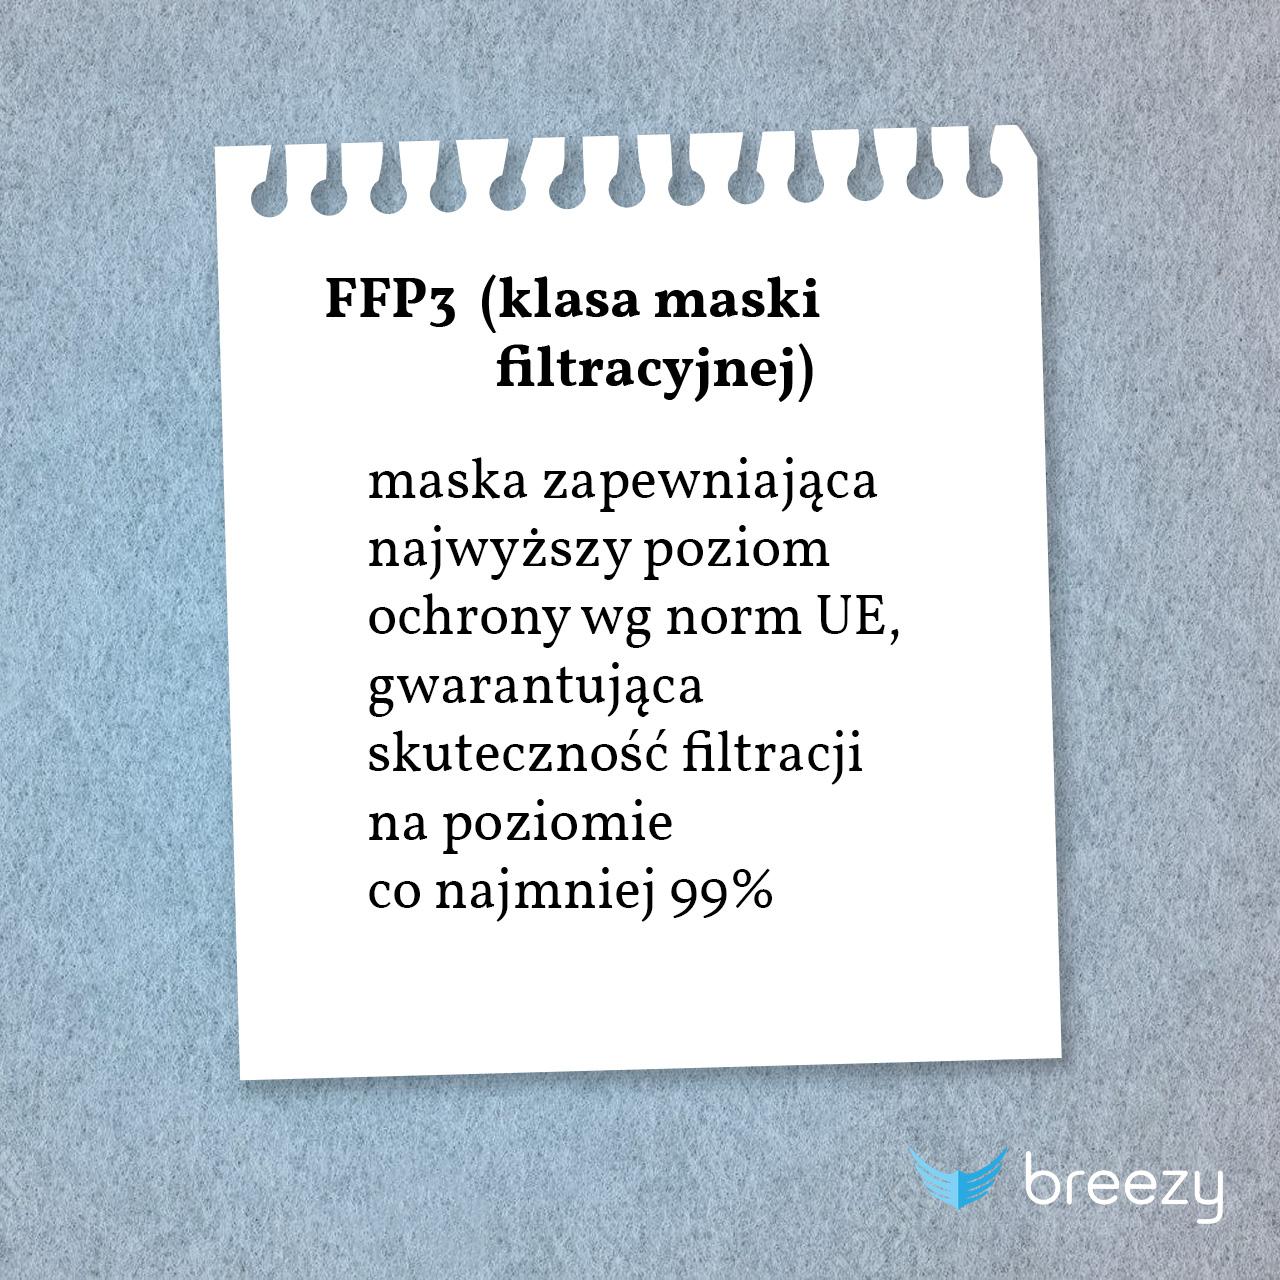 FFP2 (klasa maski filtracyjnej)